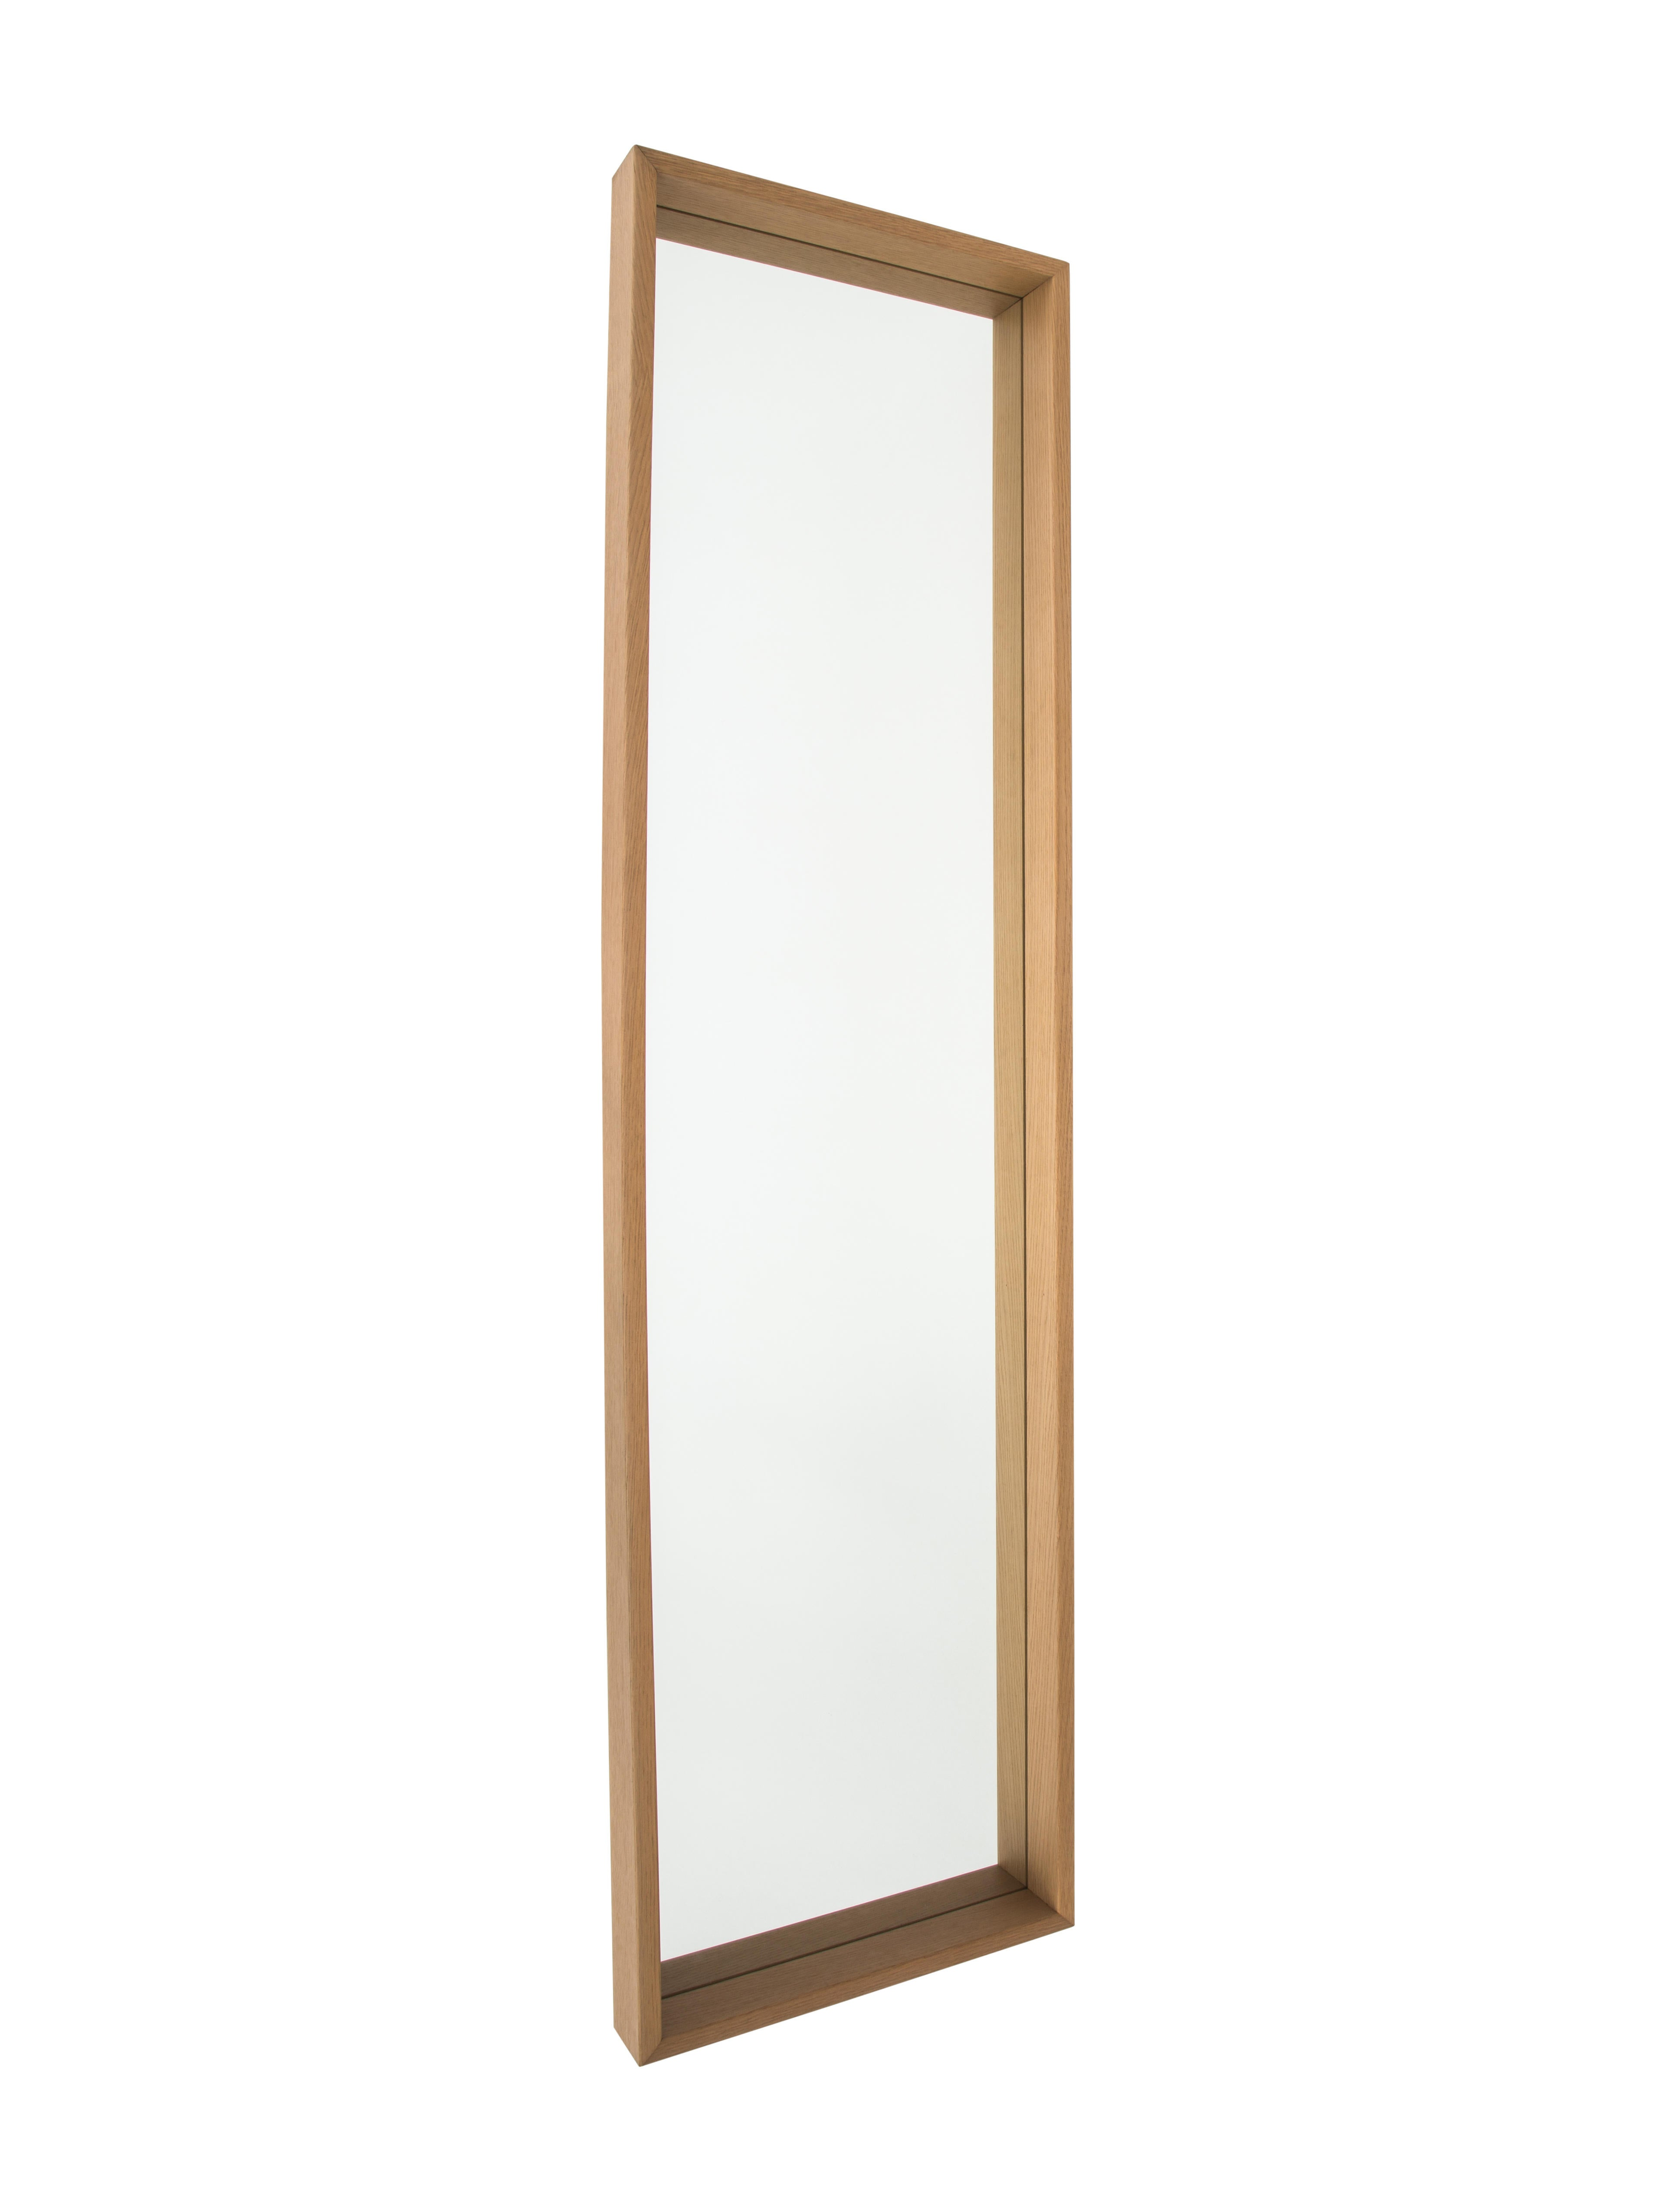 Ligne roset teri floor length mirror decor and for Decorative floor length mirrors